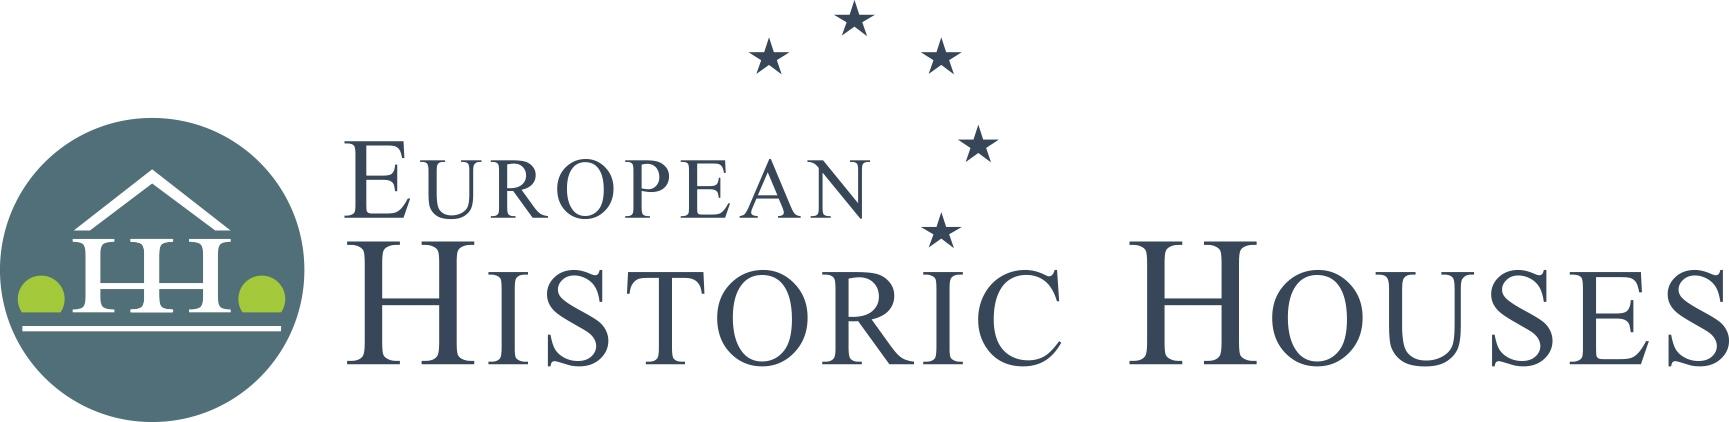 logo for European Historic Houses Association